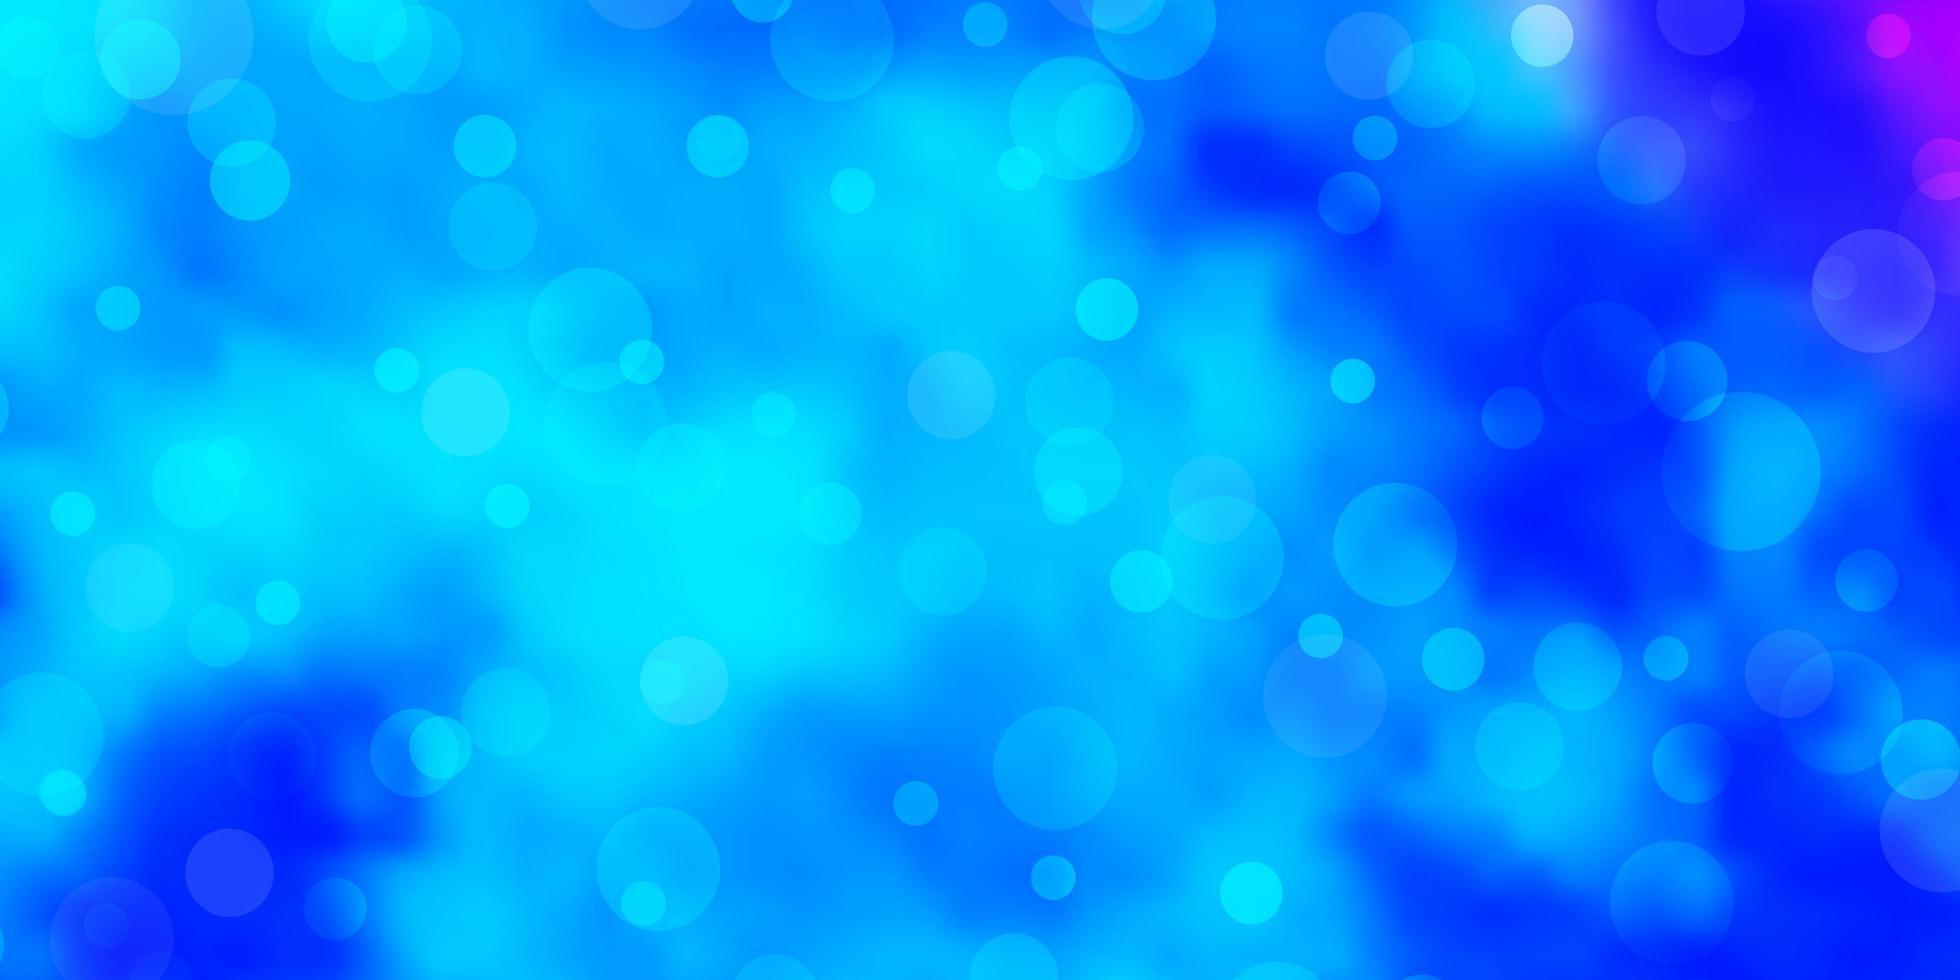 ljusrosa, blå vektorstruktur med skivor. vektor